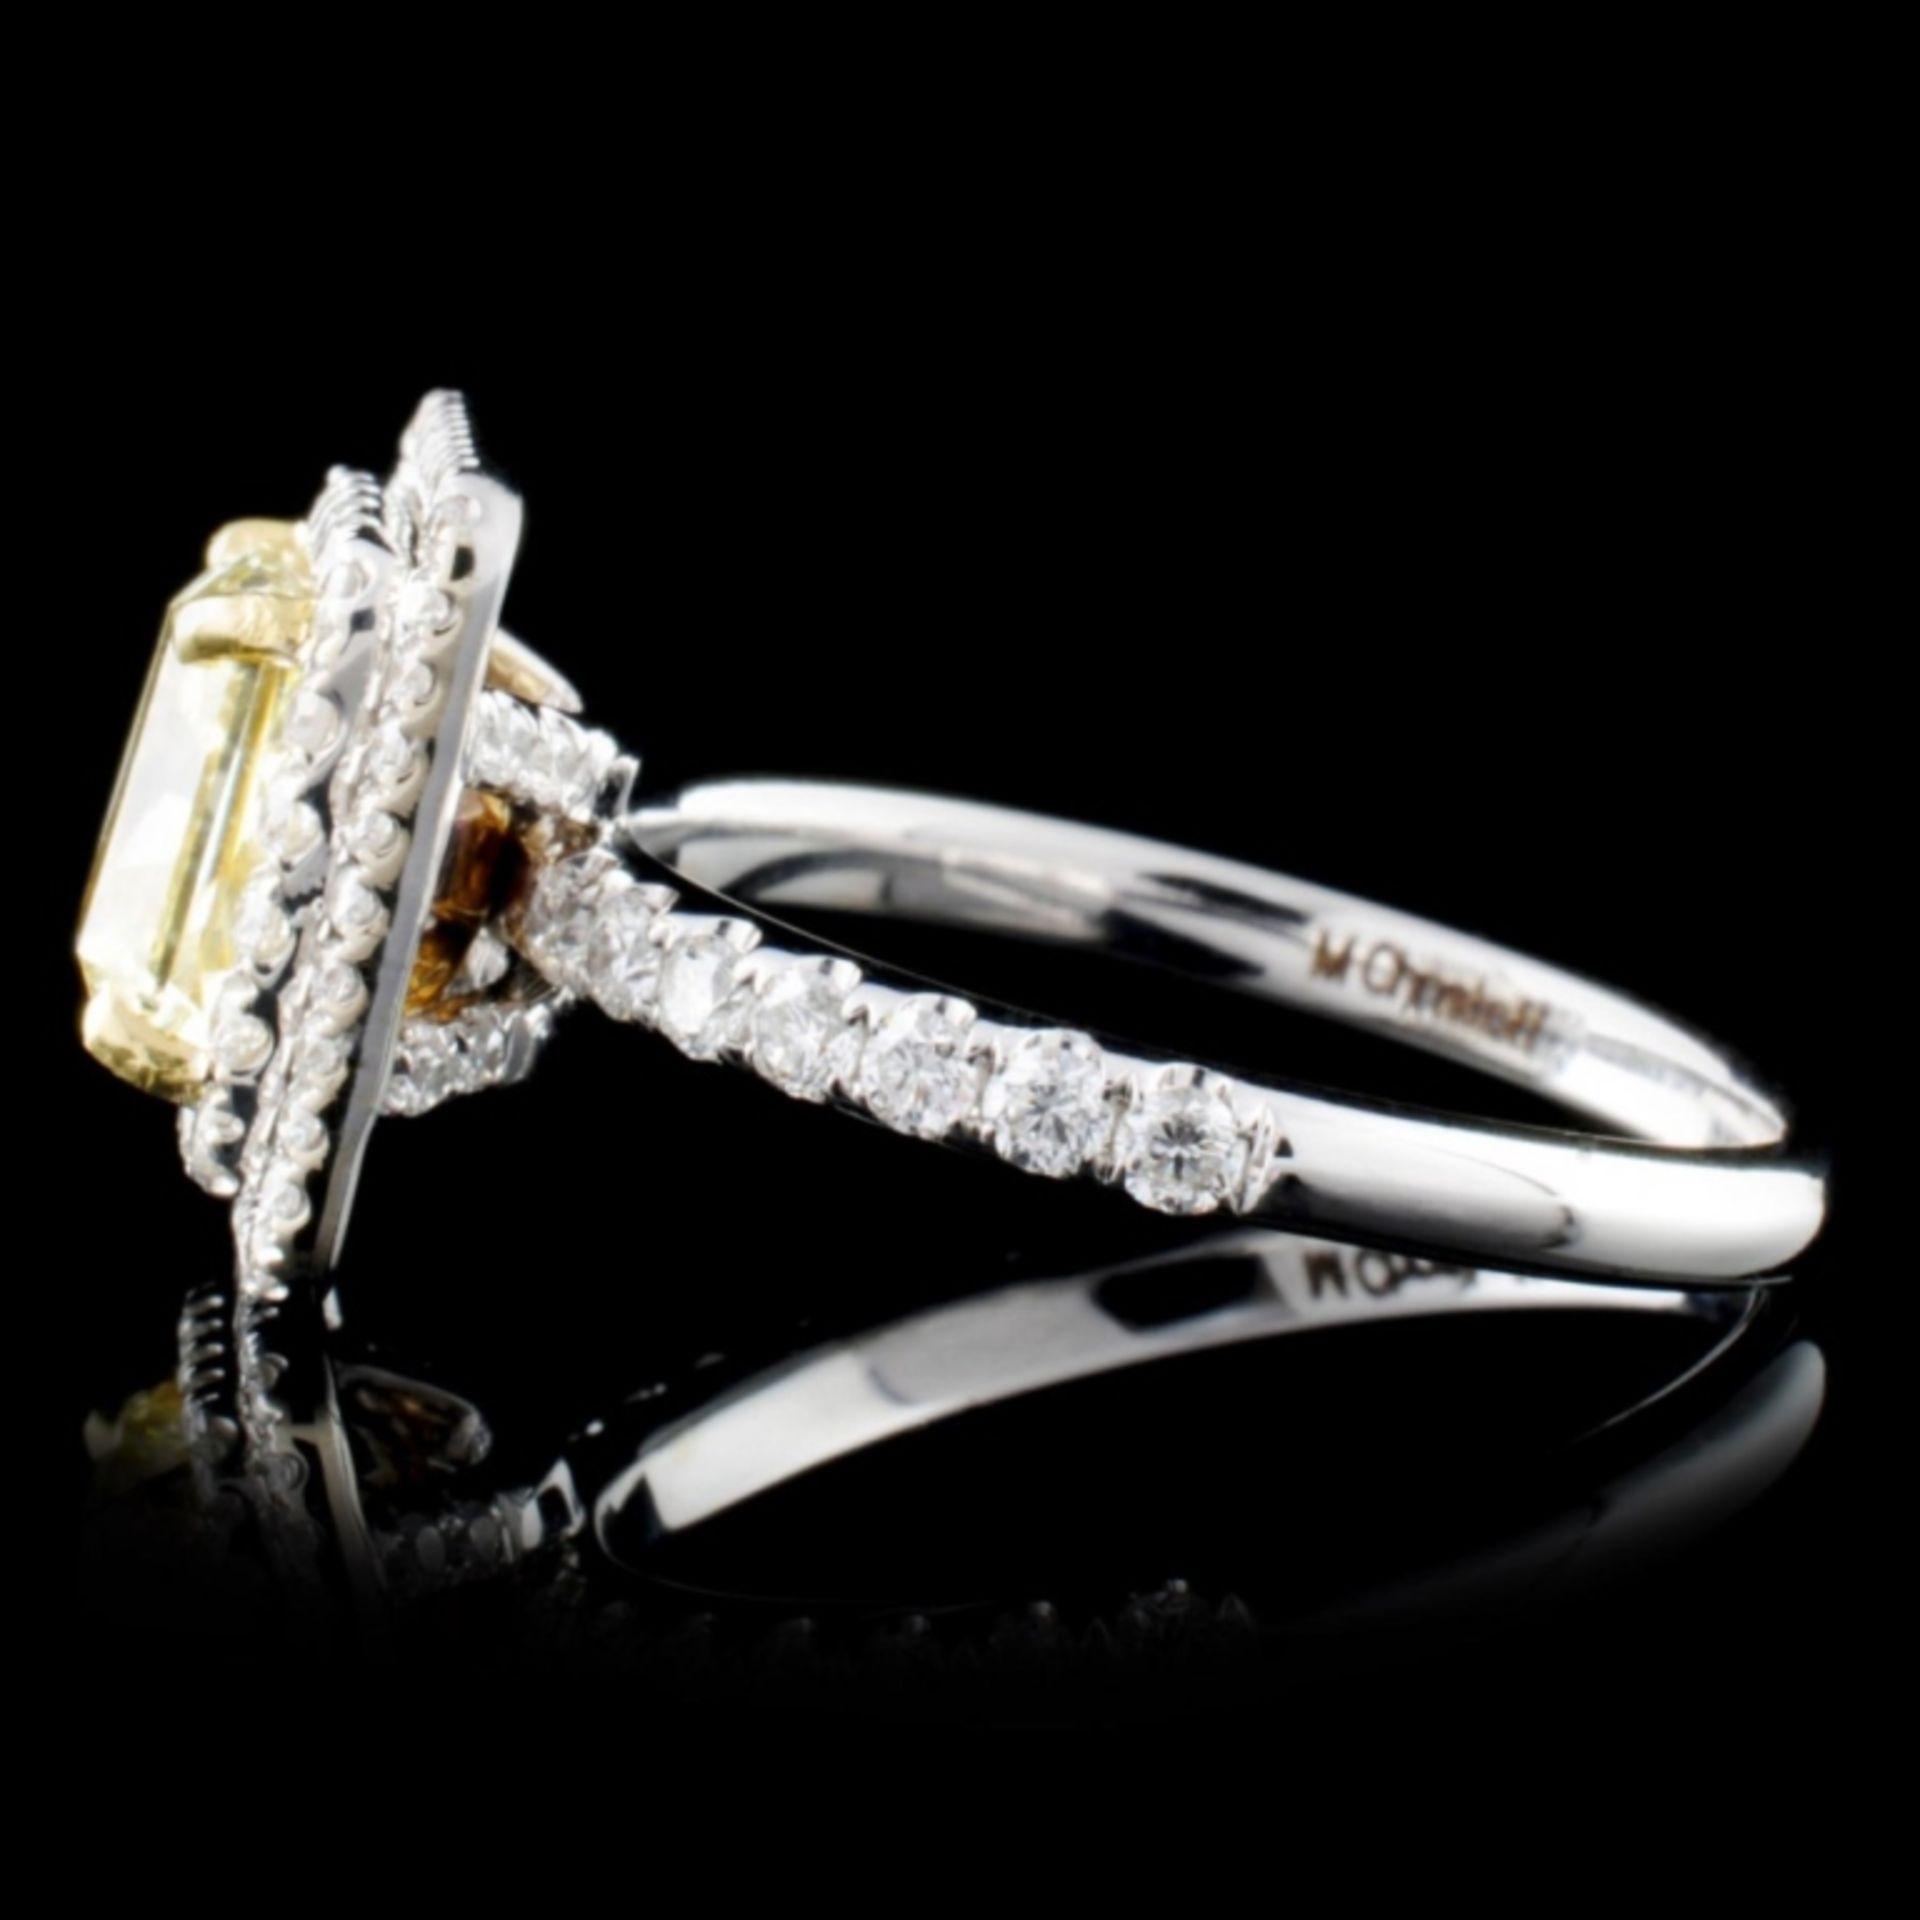 18K White Gold 2.57ctw Fancy Diamond Ring - Image 3 of 3